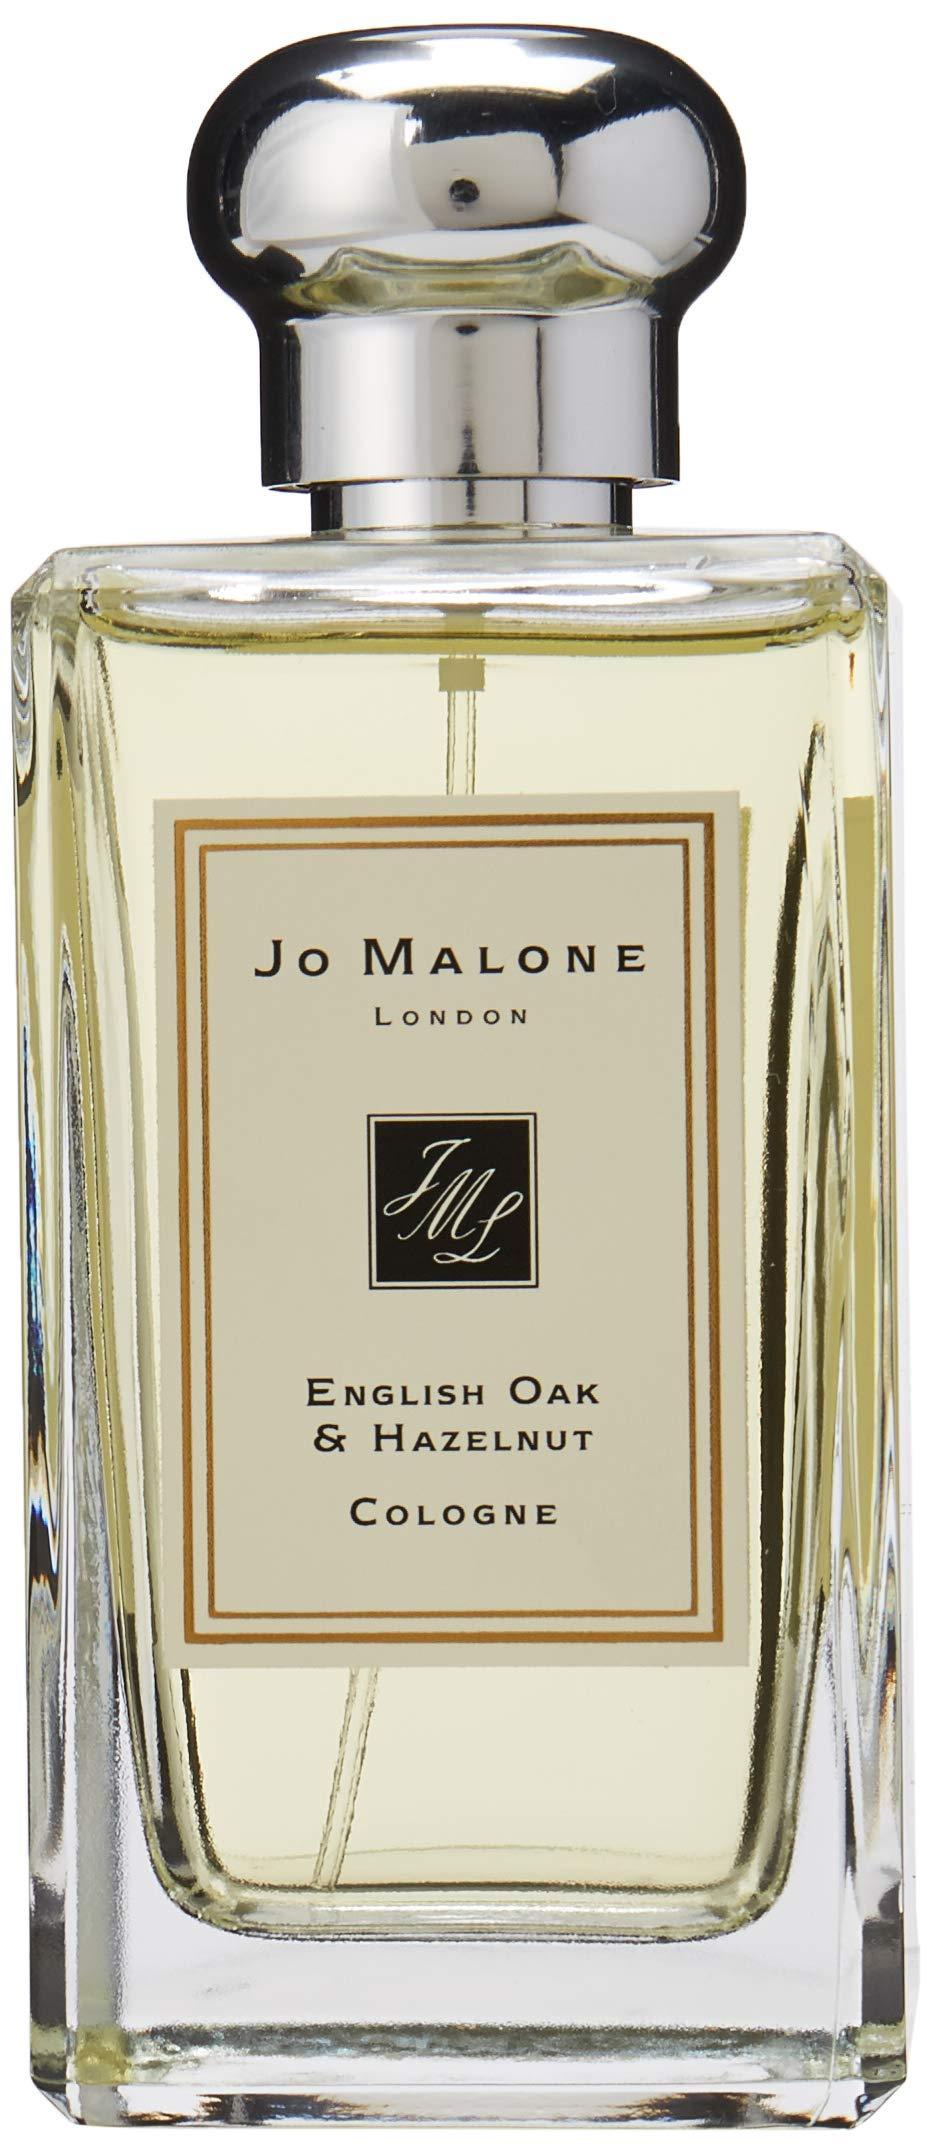 Jo Malone English Oak & Hazelnut Cologne Spray, 3.4 Ounce